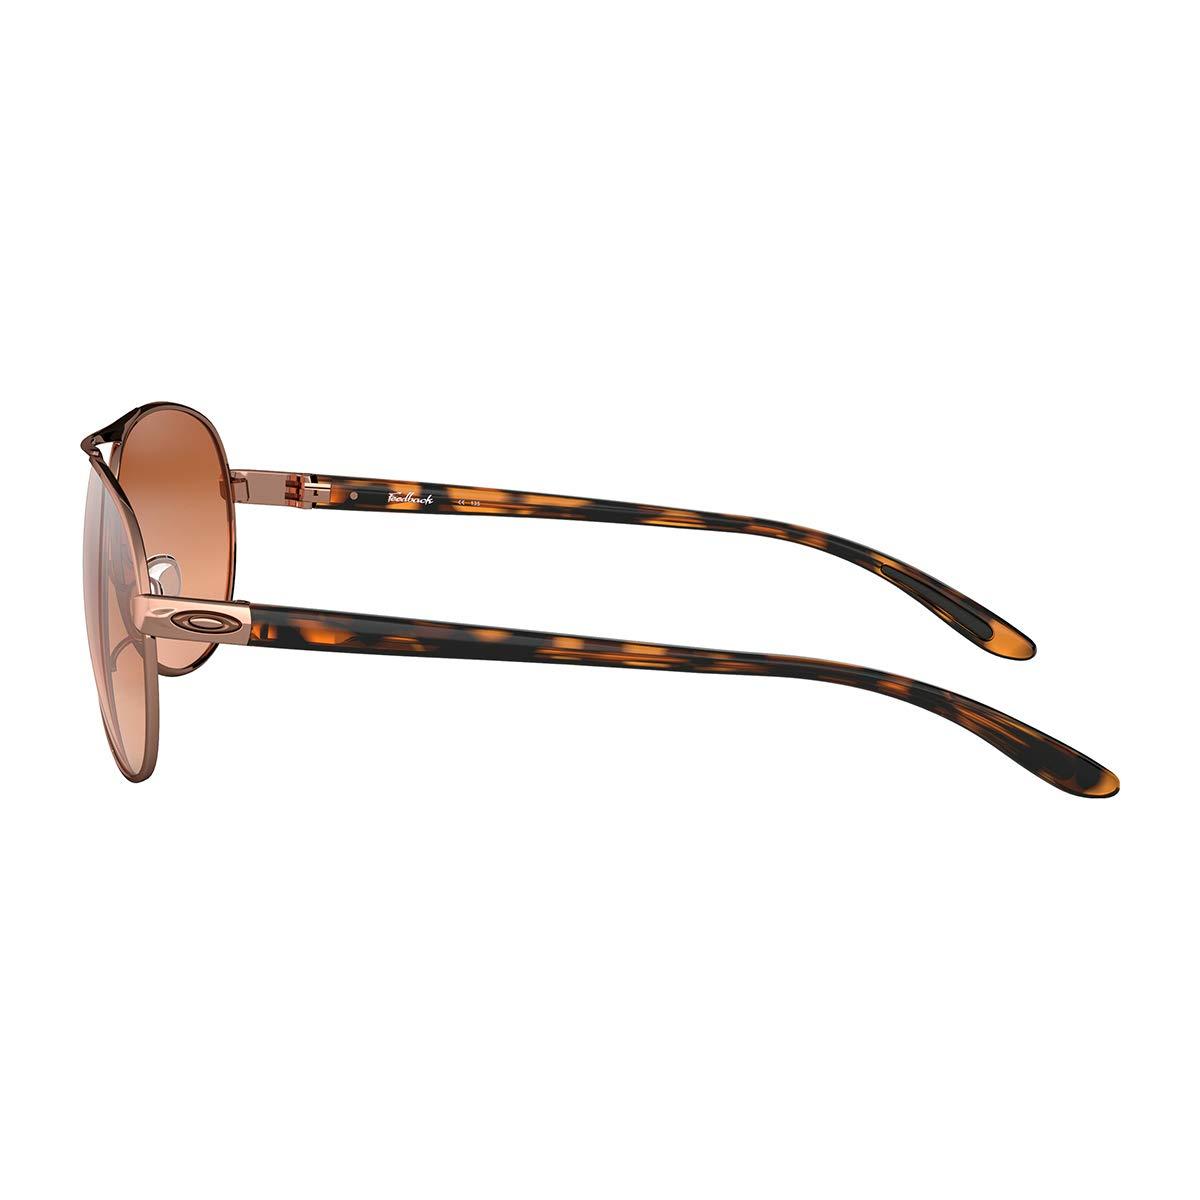 92fbcff3d6 Amazon.com  Oakley Women s Metal Woman Sunglass Polarized Aviator ...